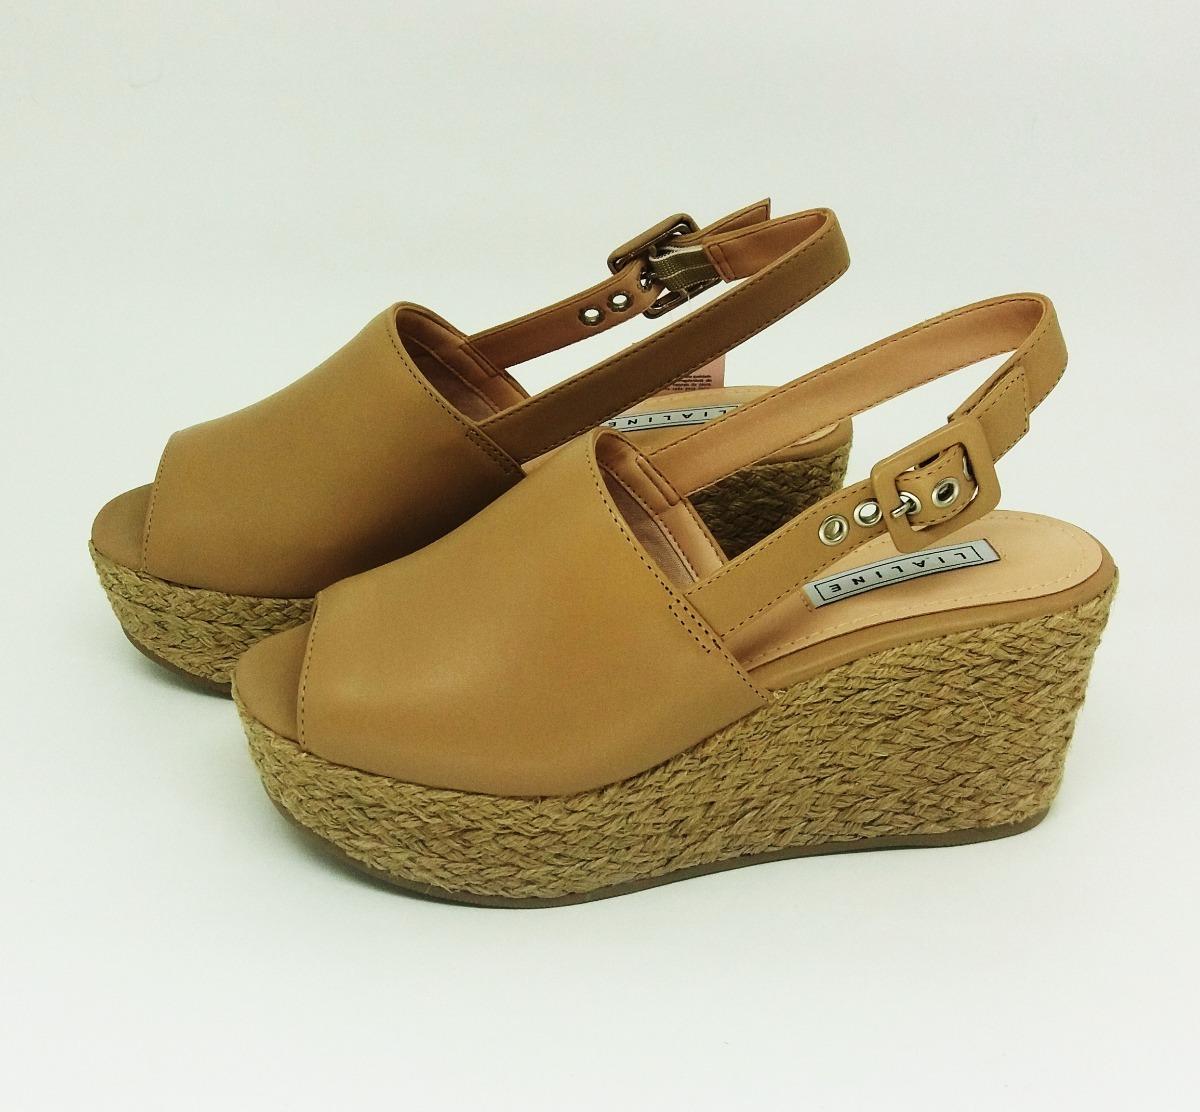 4f8c979f99 sandália anabela feminina tamanco bege lialine 9010. Carregando zoom.